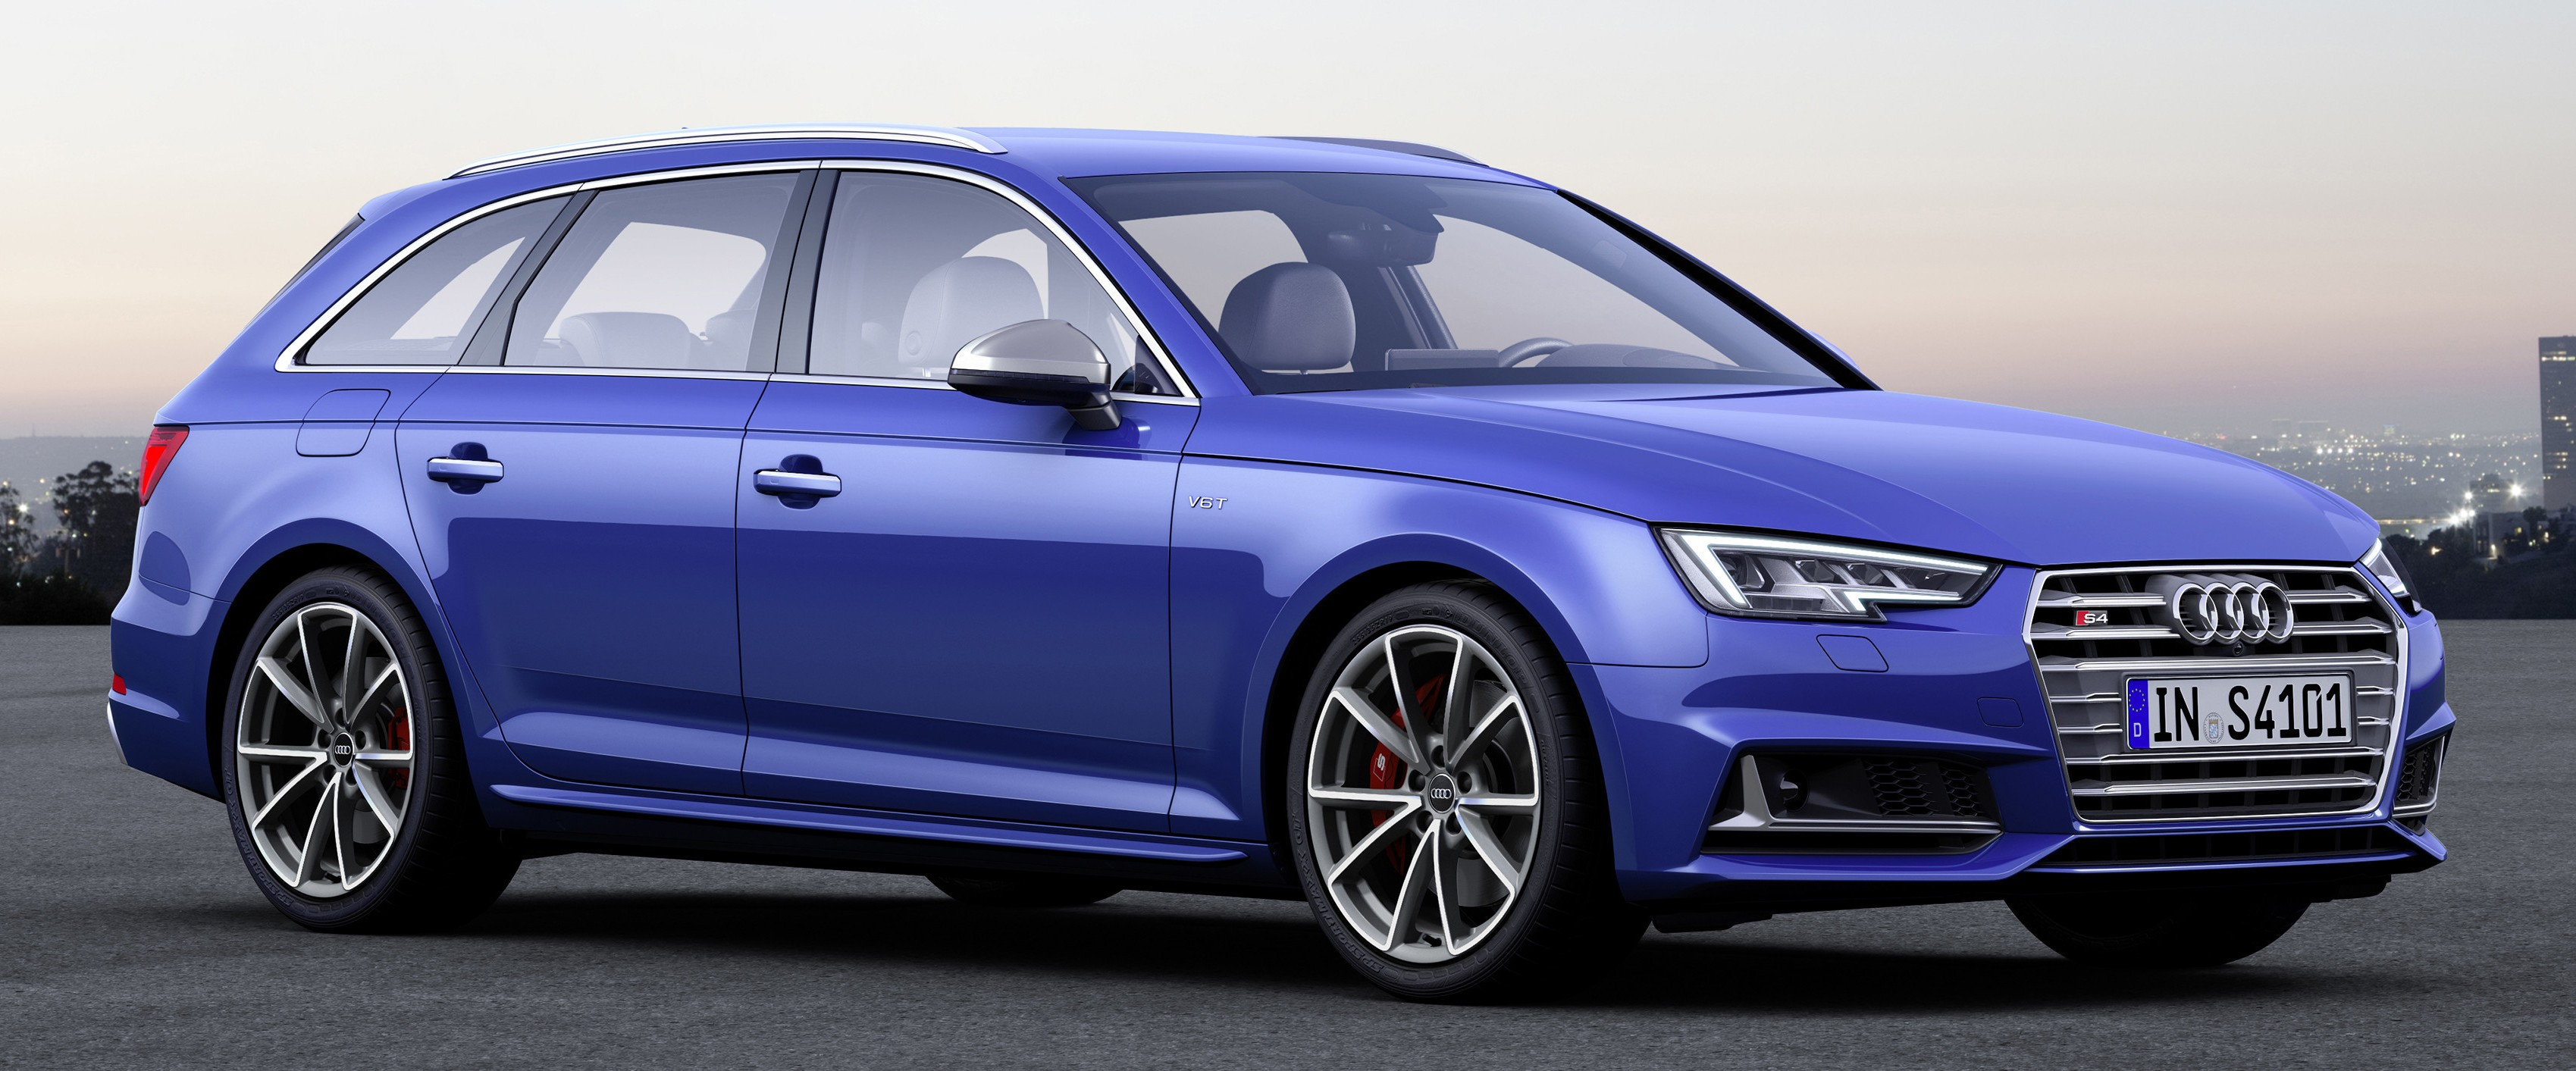 B9 Audi S4 Avant Revealed 354 Hp 500 Nm Estate Paul Tan